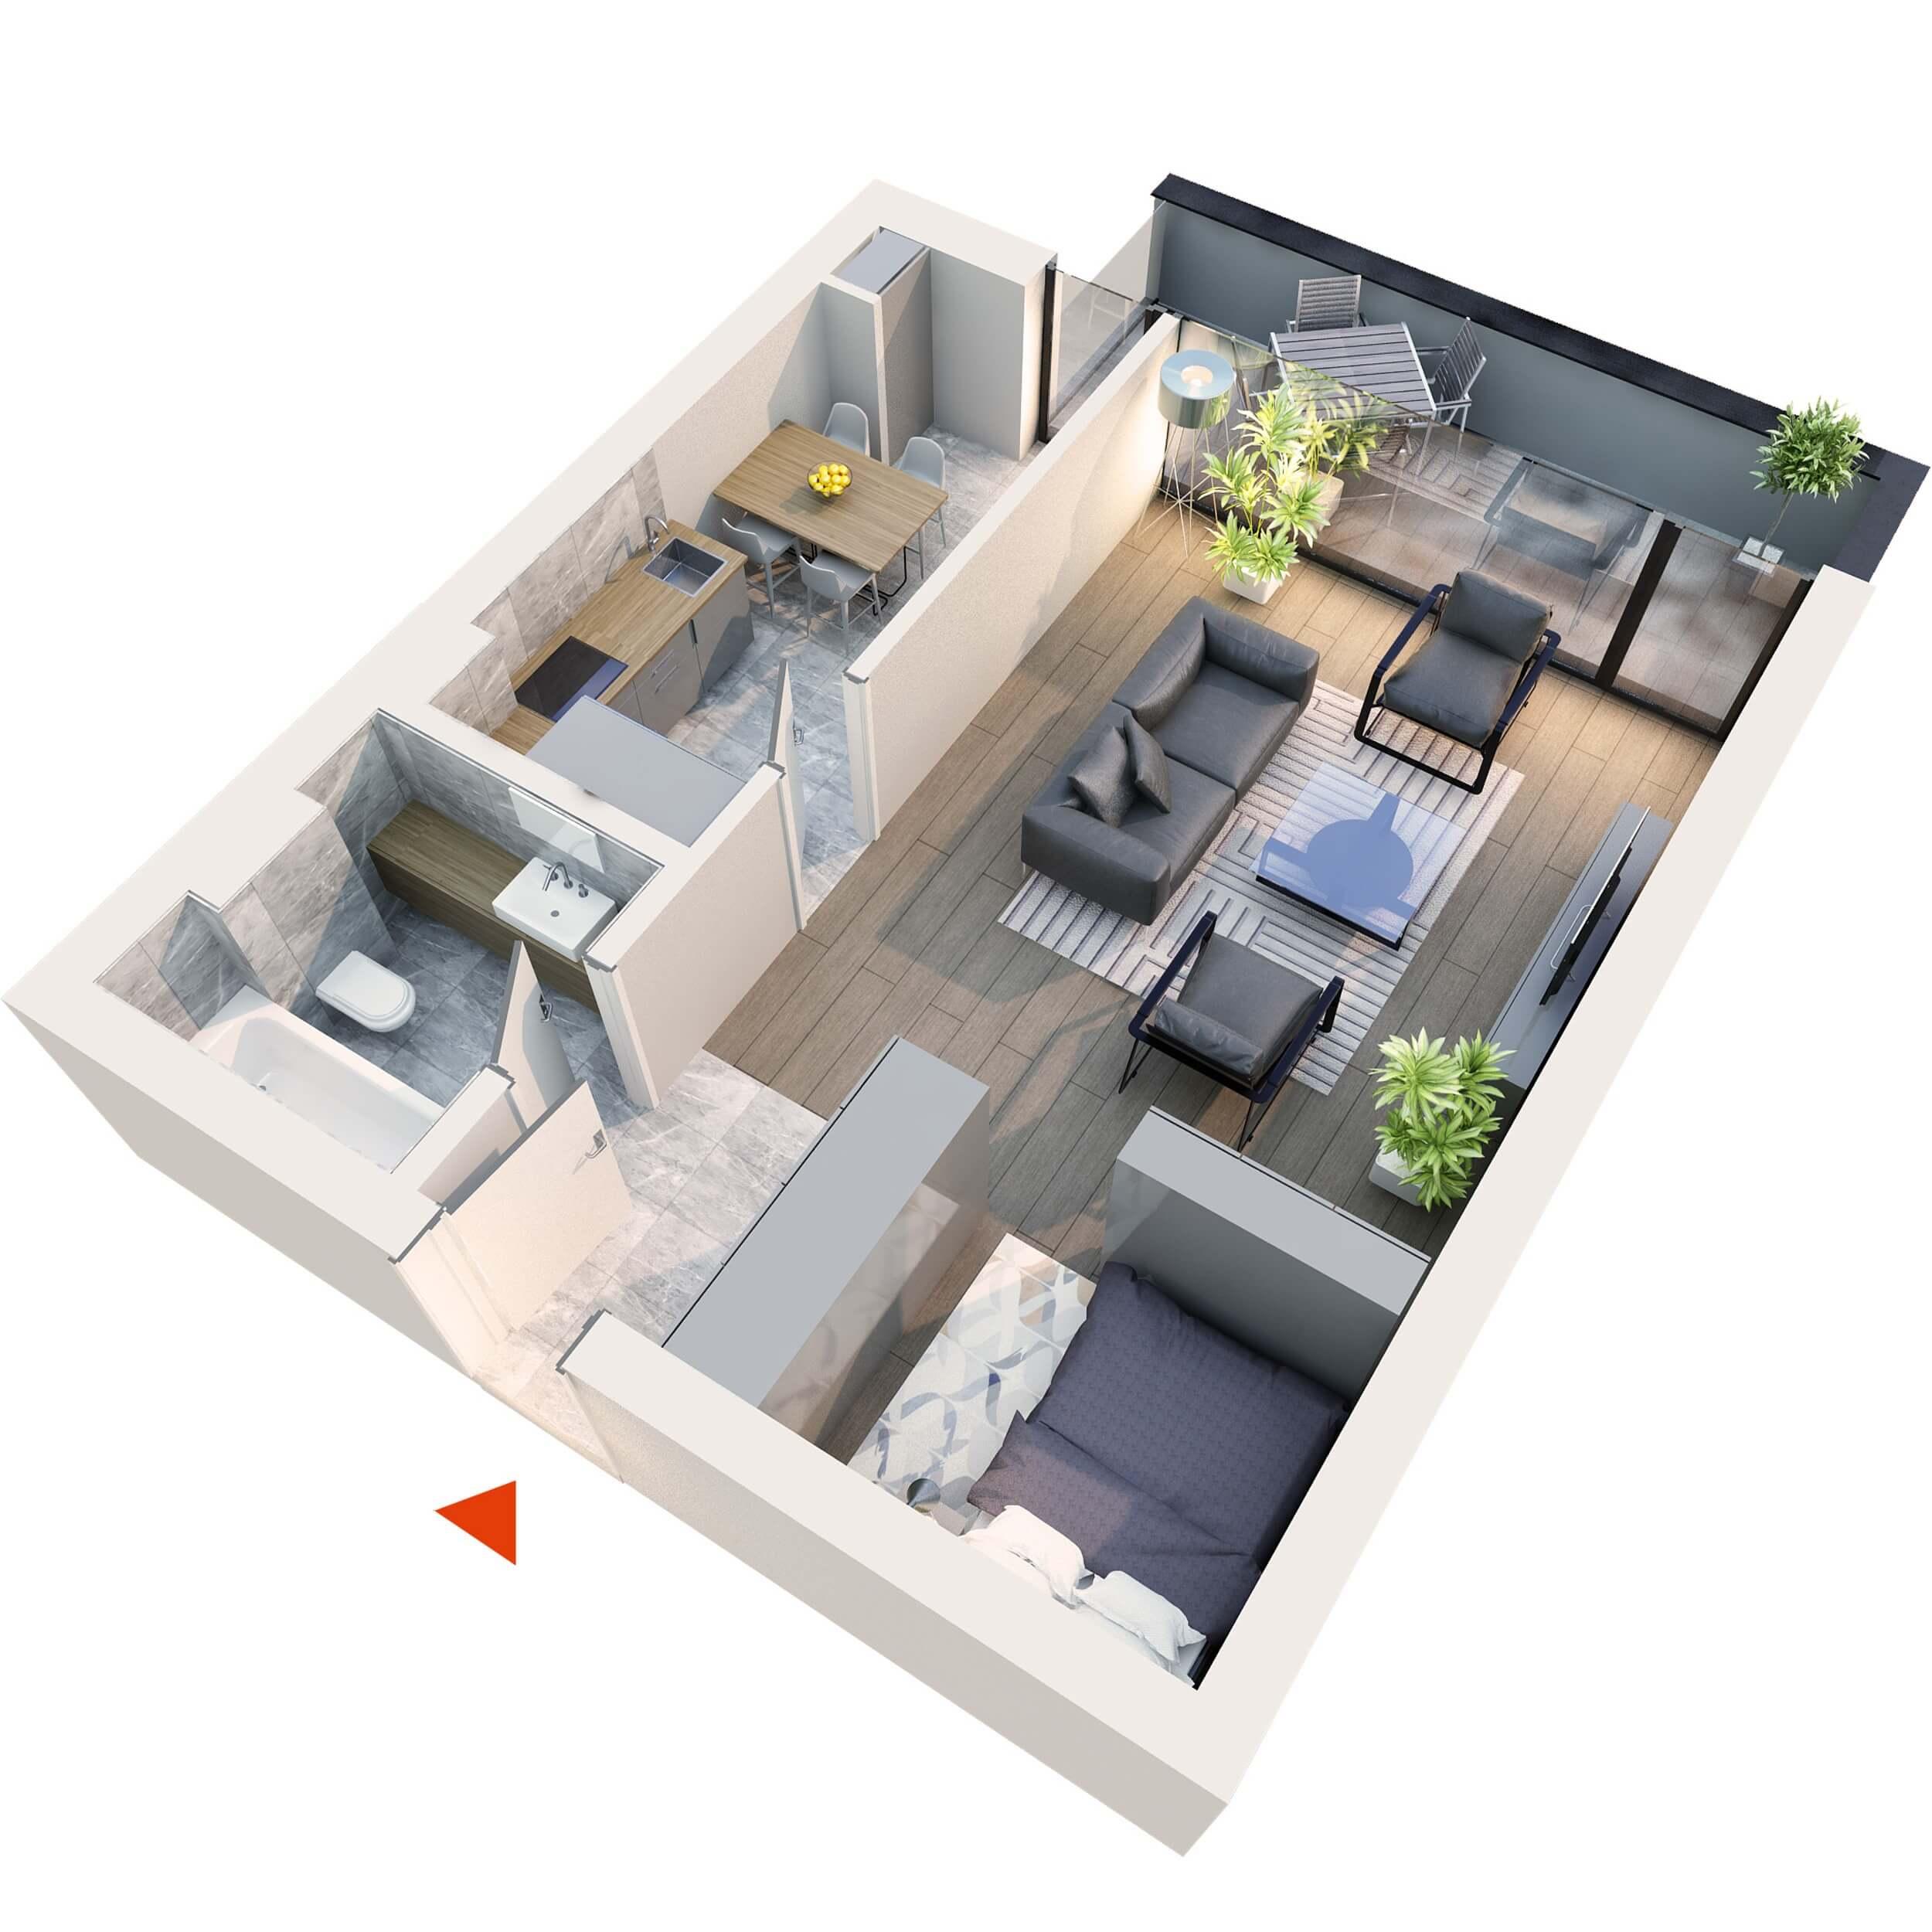 "Apartament Studio tip 1D1"" | Balcon | Etaj 6 | Corp C7 | Faza 2"